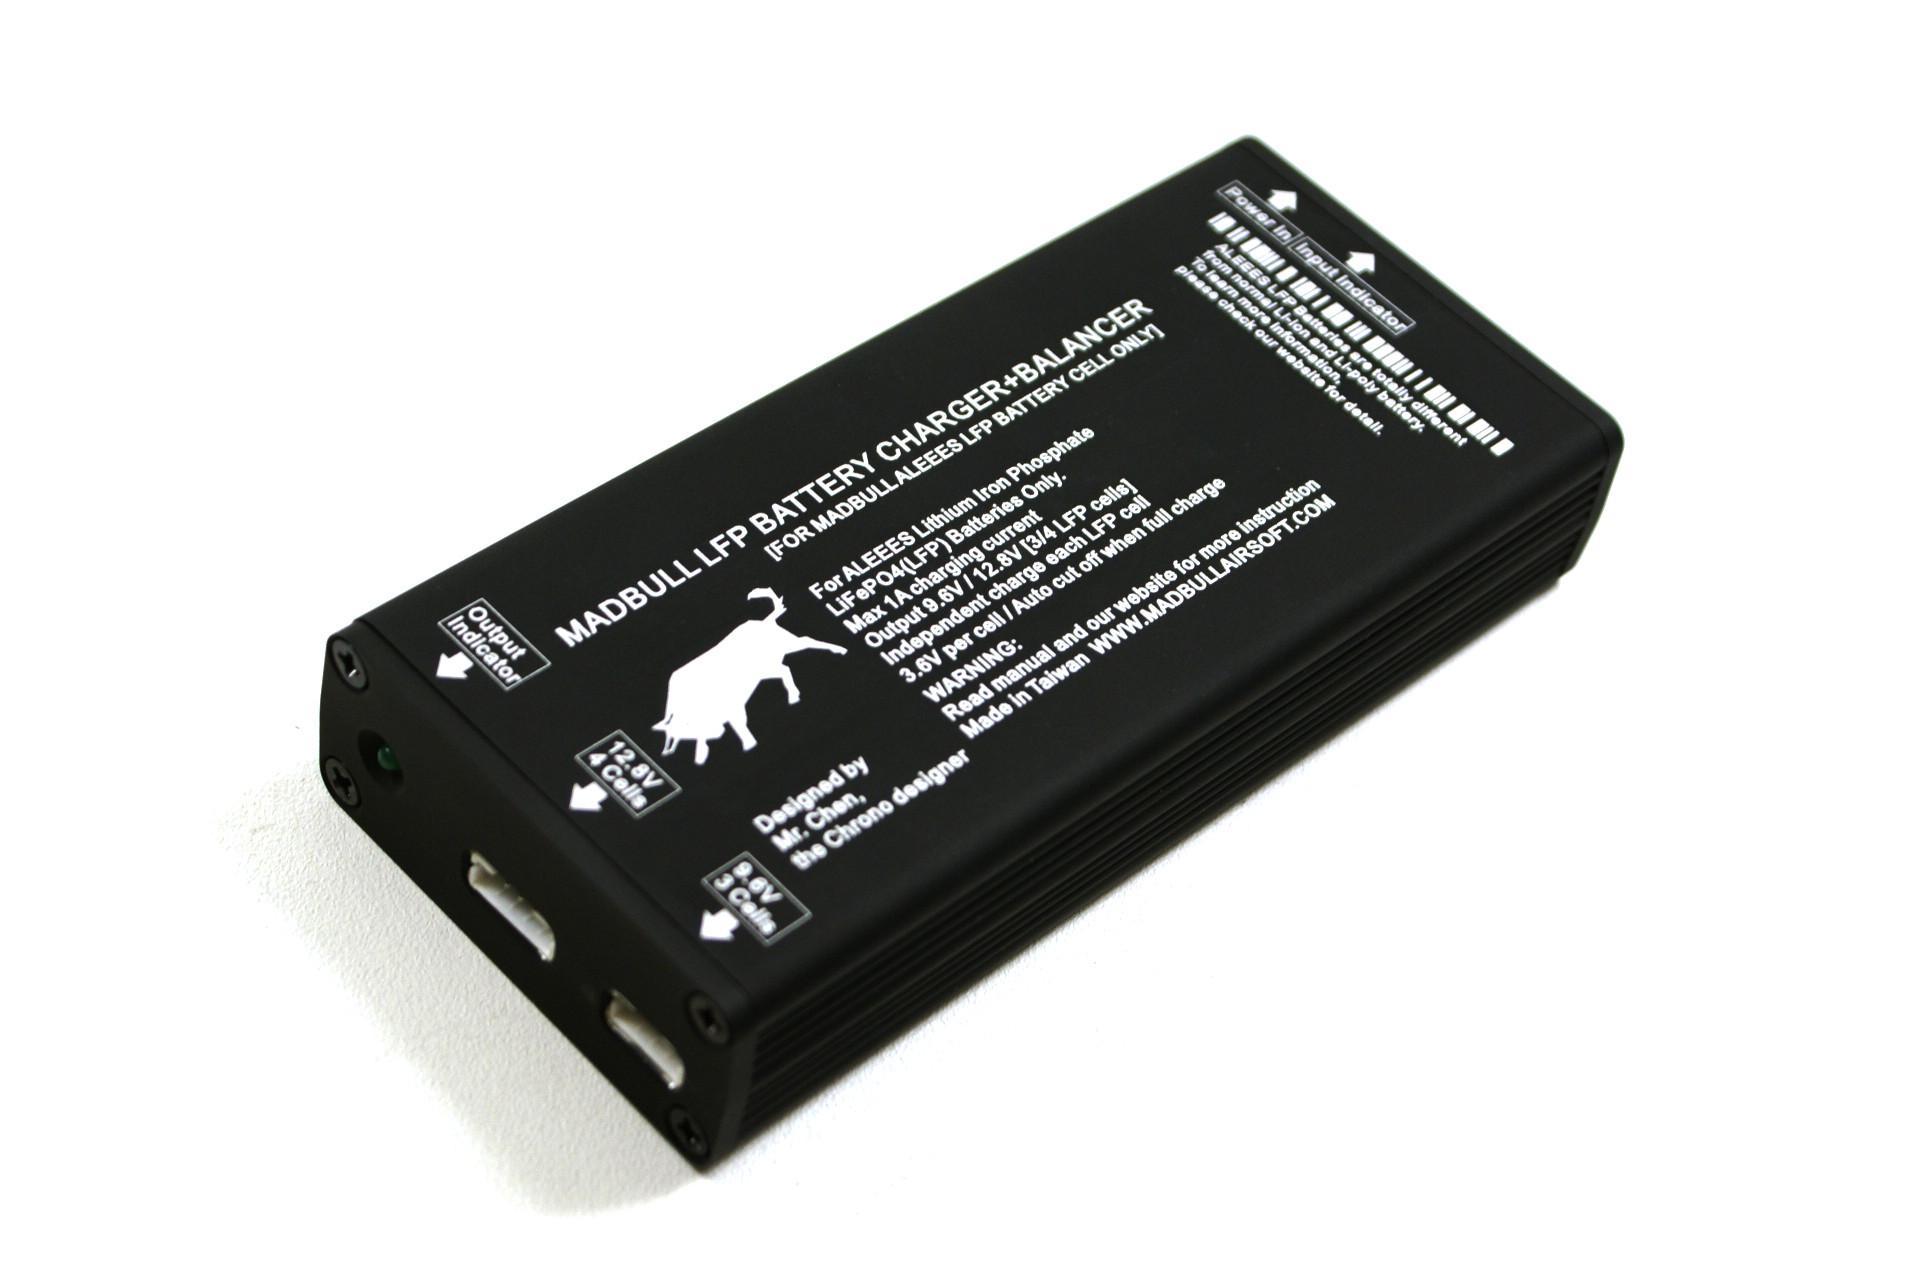 Lfp Battery Charger Lipo Battery Lfp Lithium Lipo